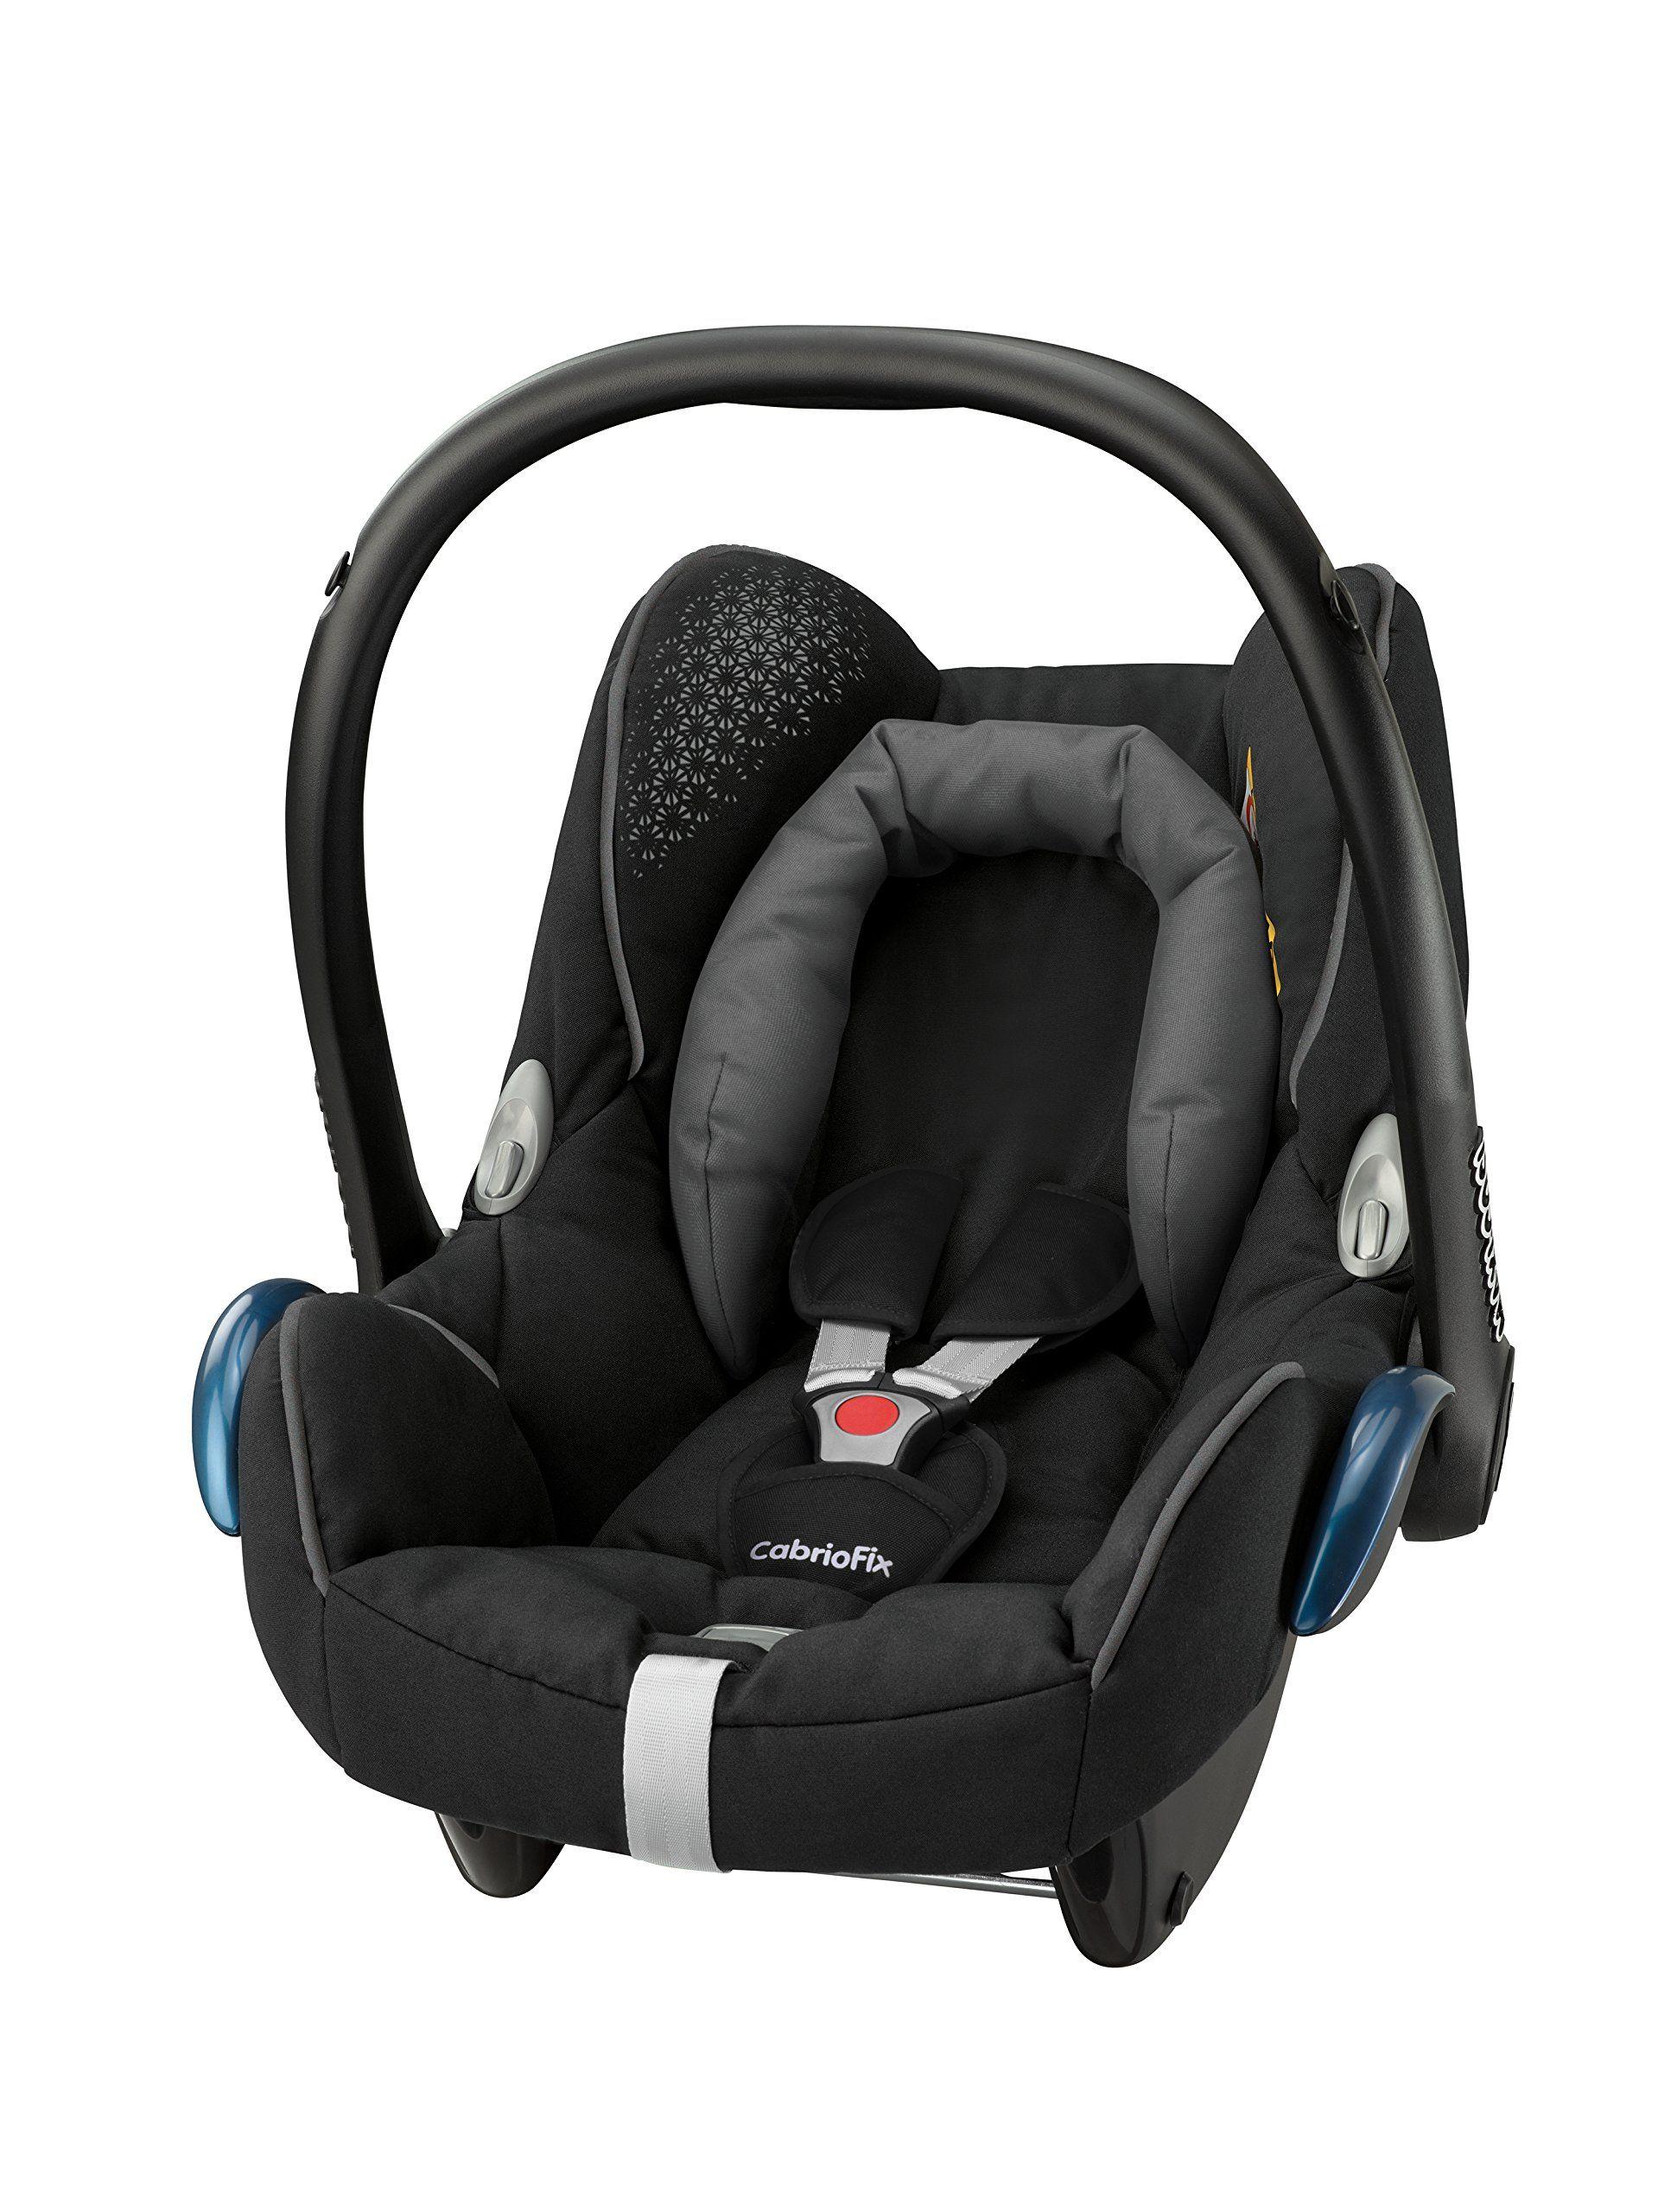 MaxiCosi CabrioFix Car Seat (Raspberry Red) Amazon.co.uk